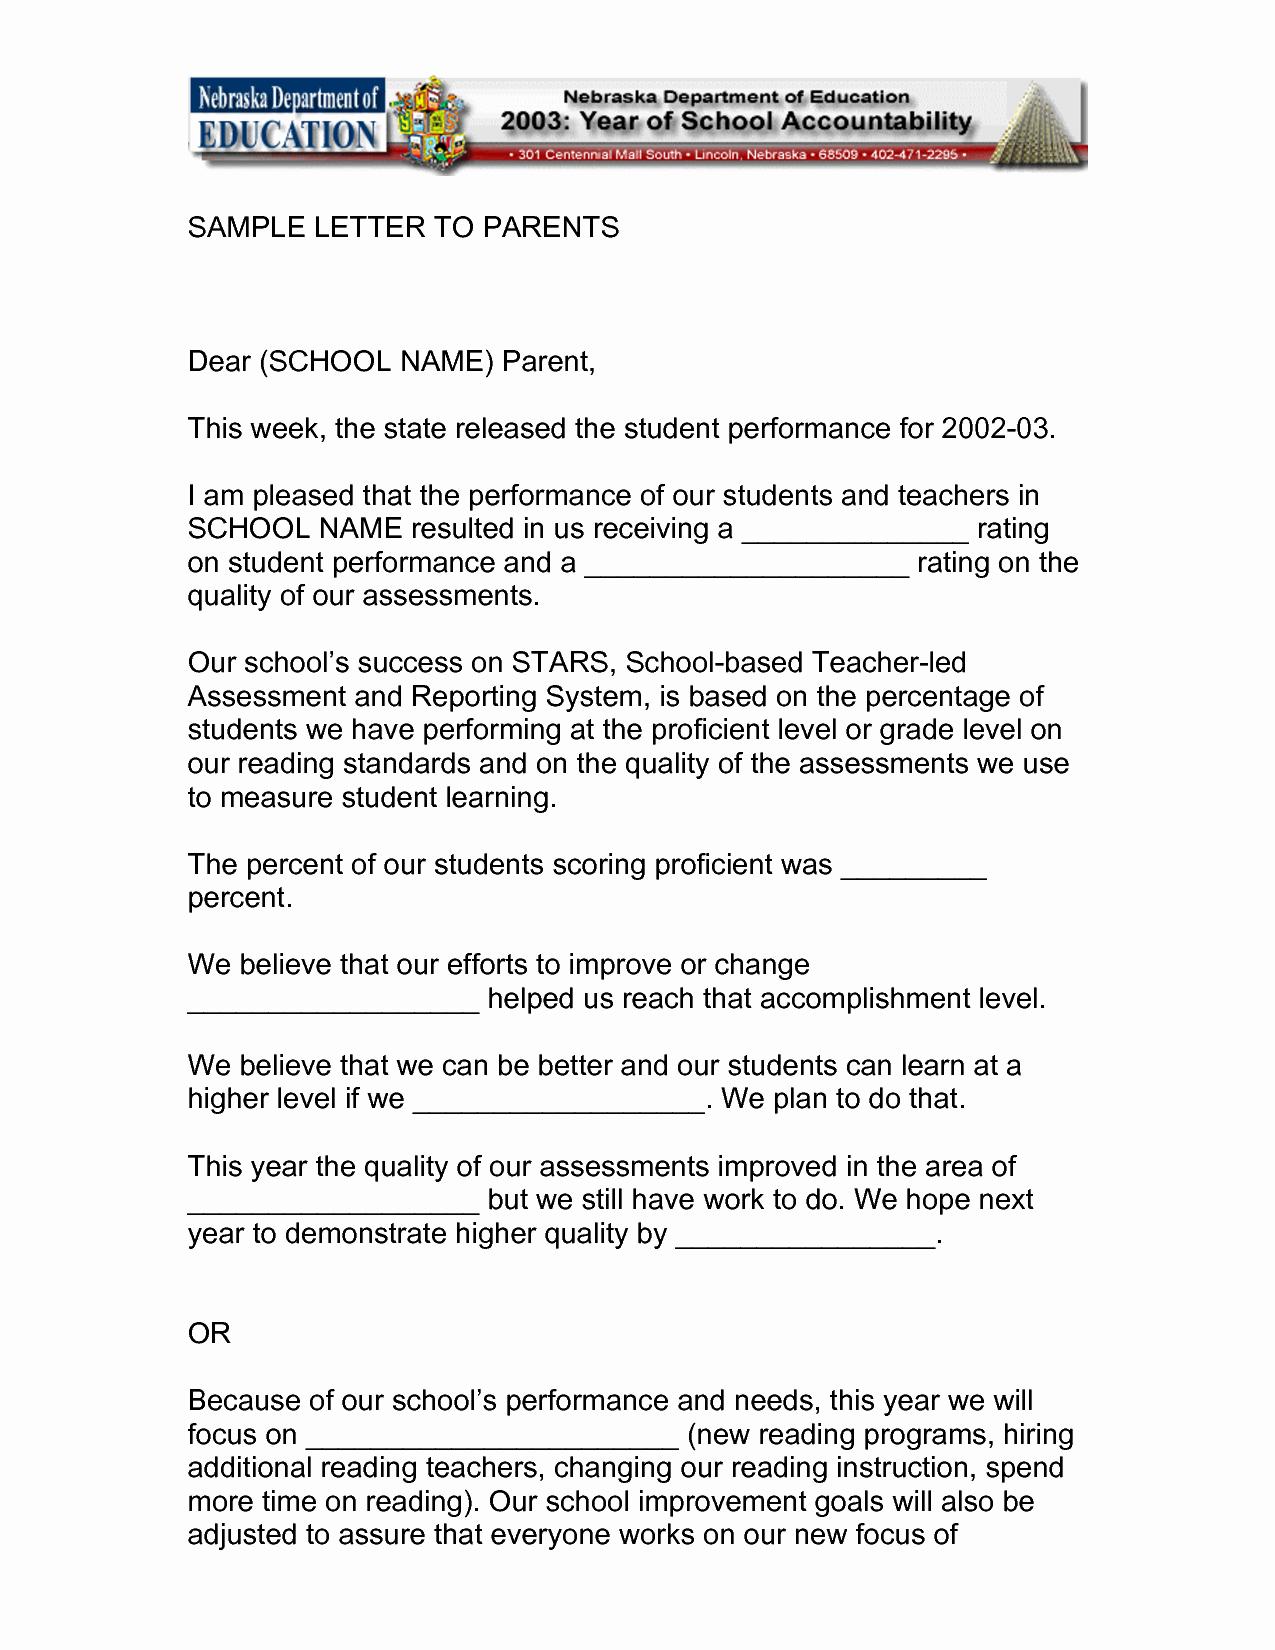 Letters to Parents Template Fresh Dear Parents Letter From Teacher Sample